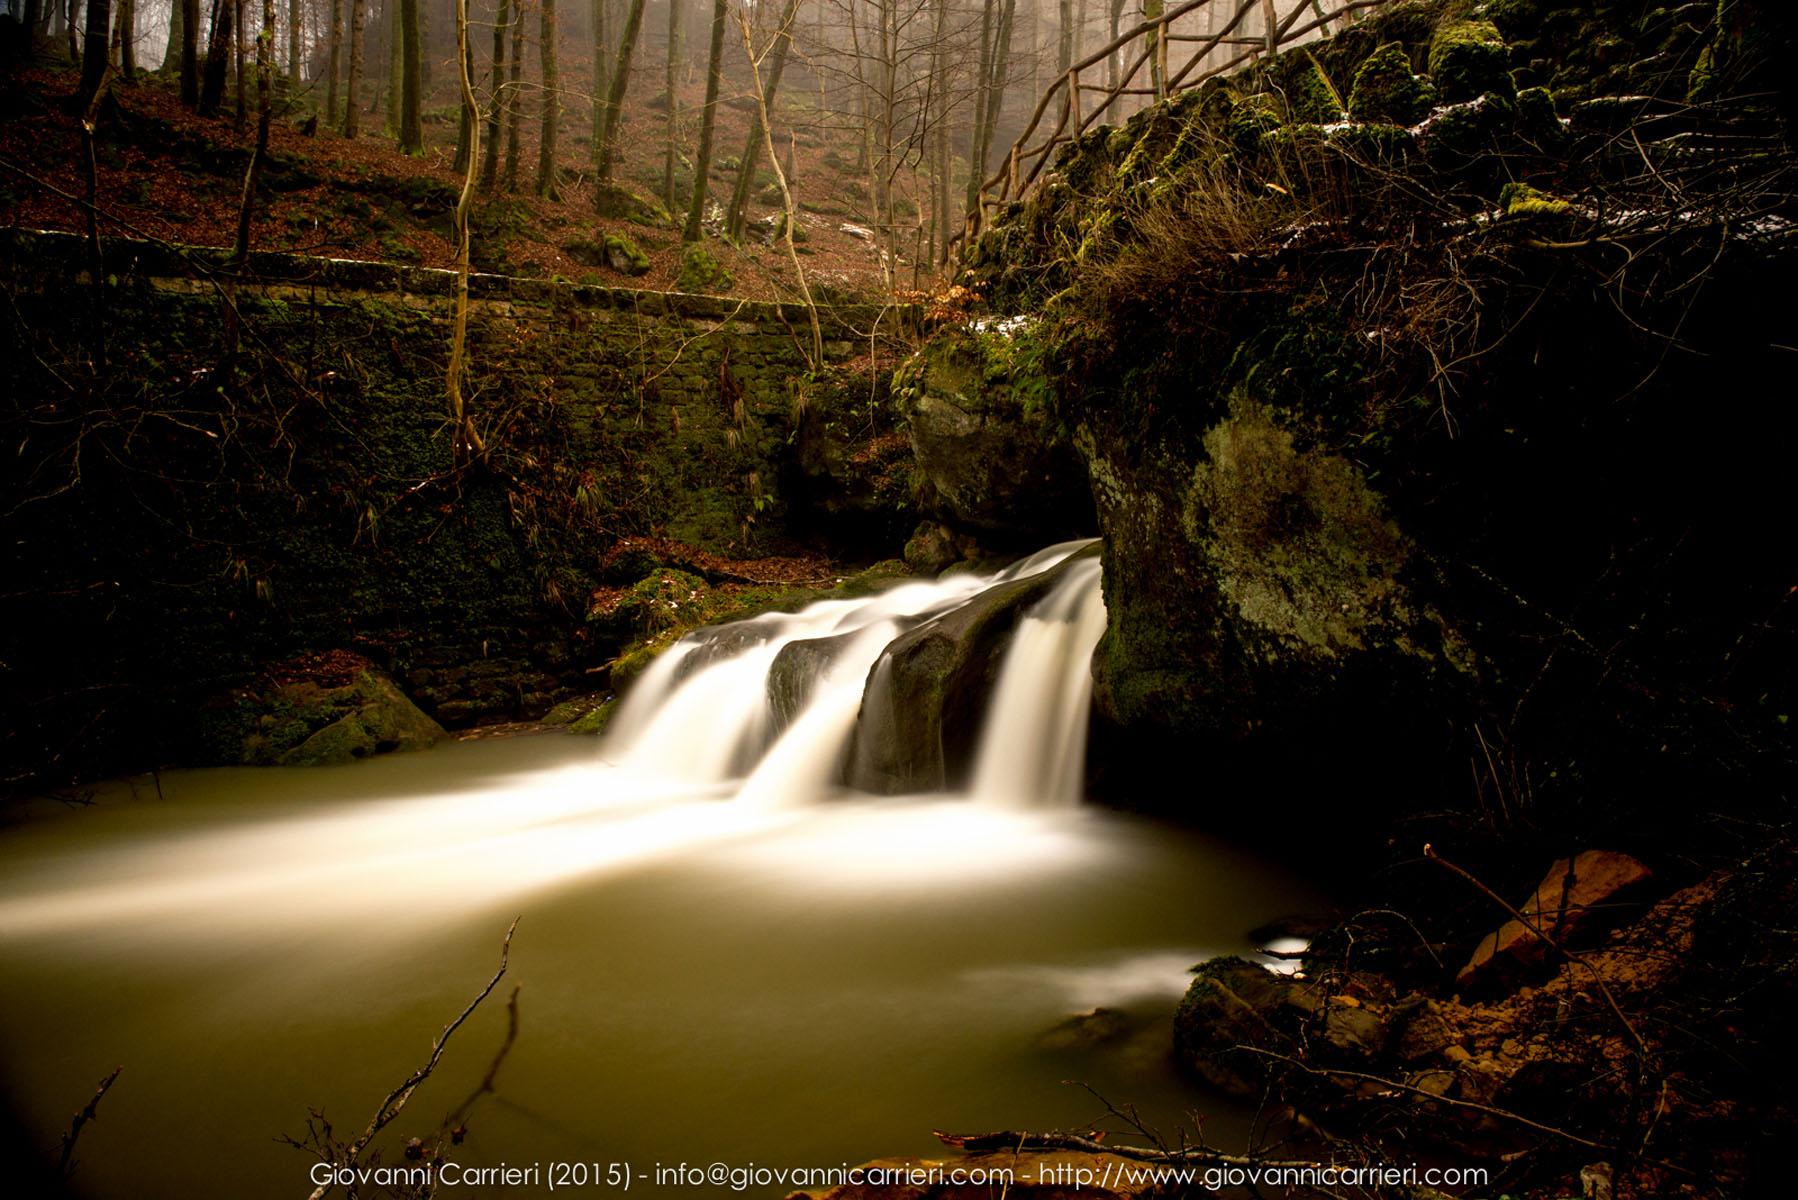 Le Cascate Mullerthal nella piccola svizzera Lussemburghese